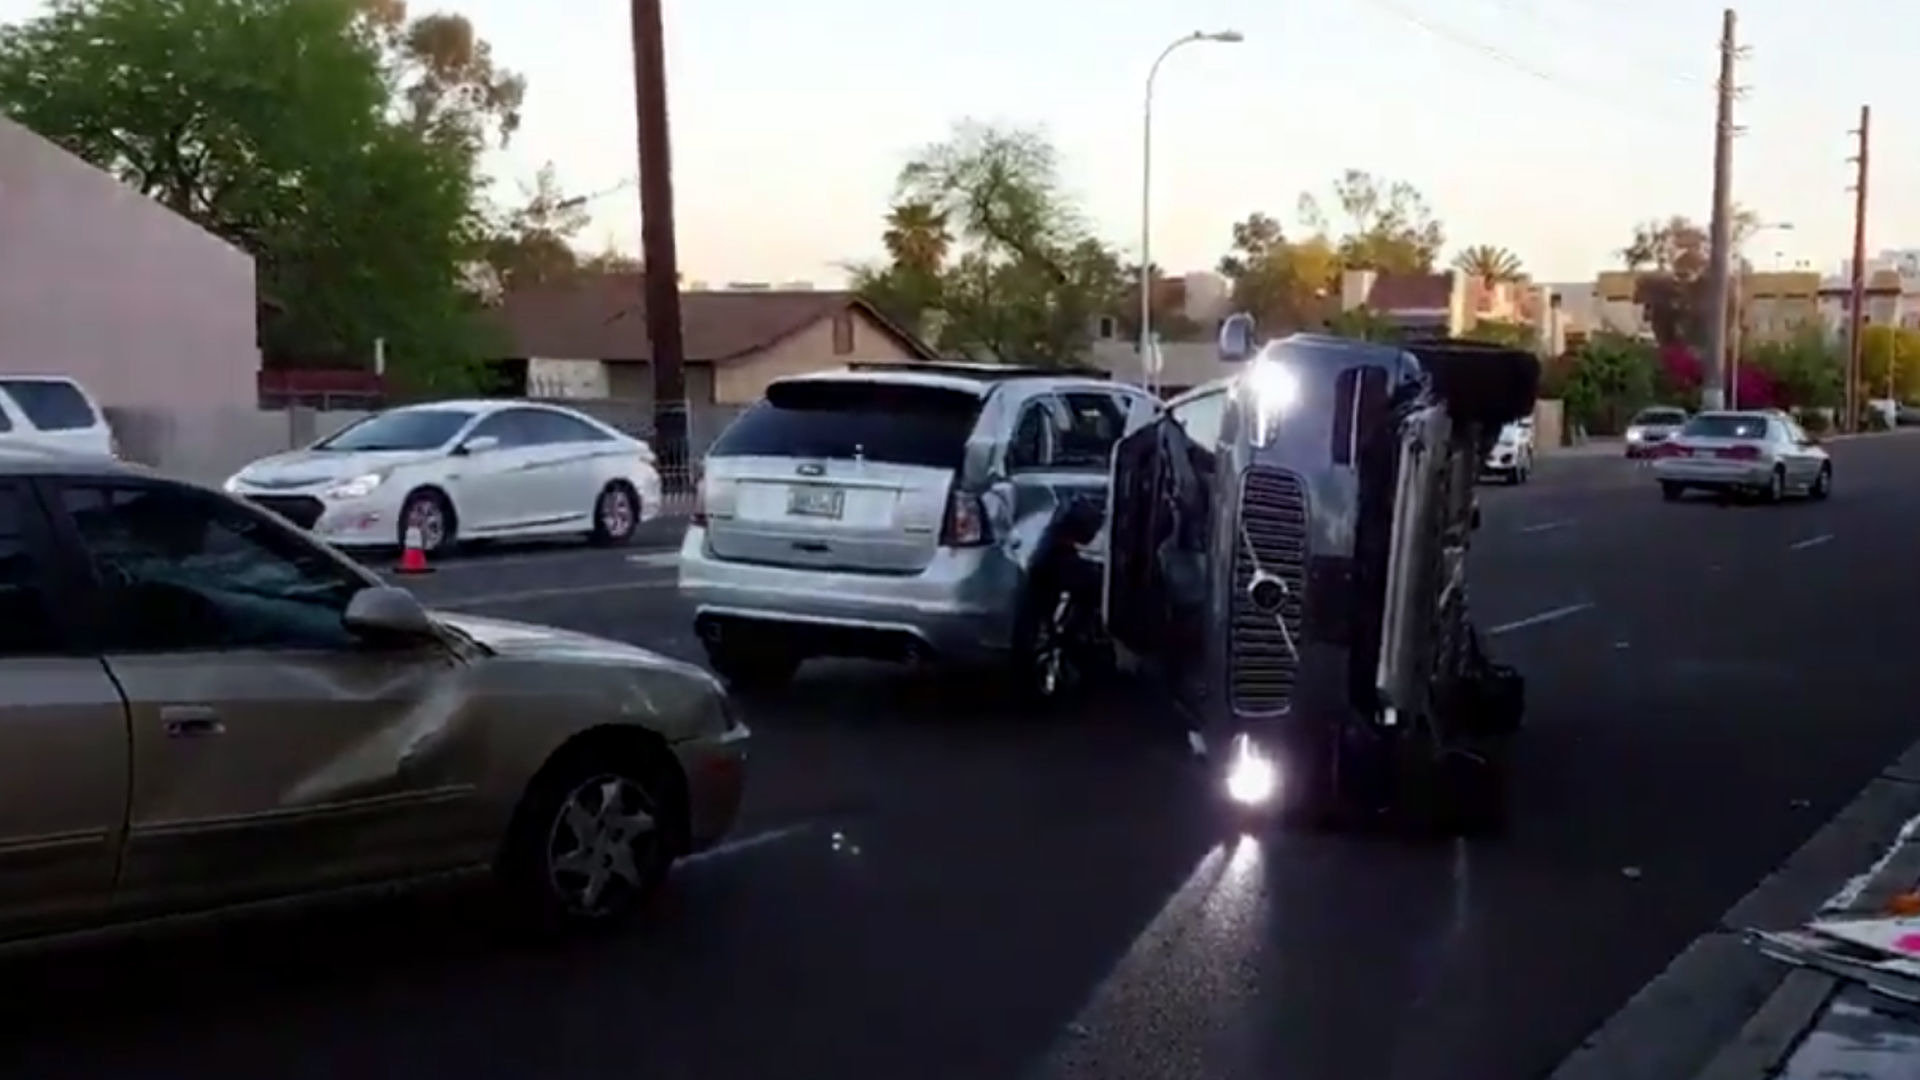 crash uber stoppe momentan ment ses voitures autonomes. Black Bedroom Furniture Sets. Home Design Ideas